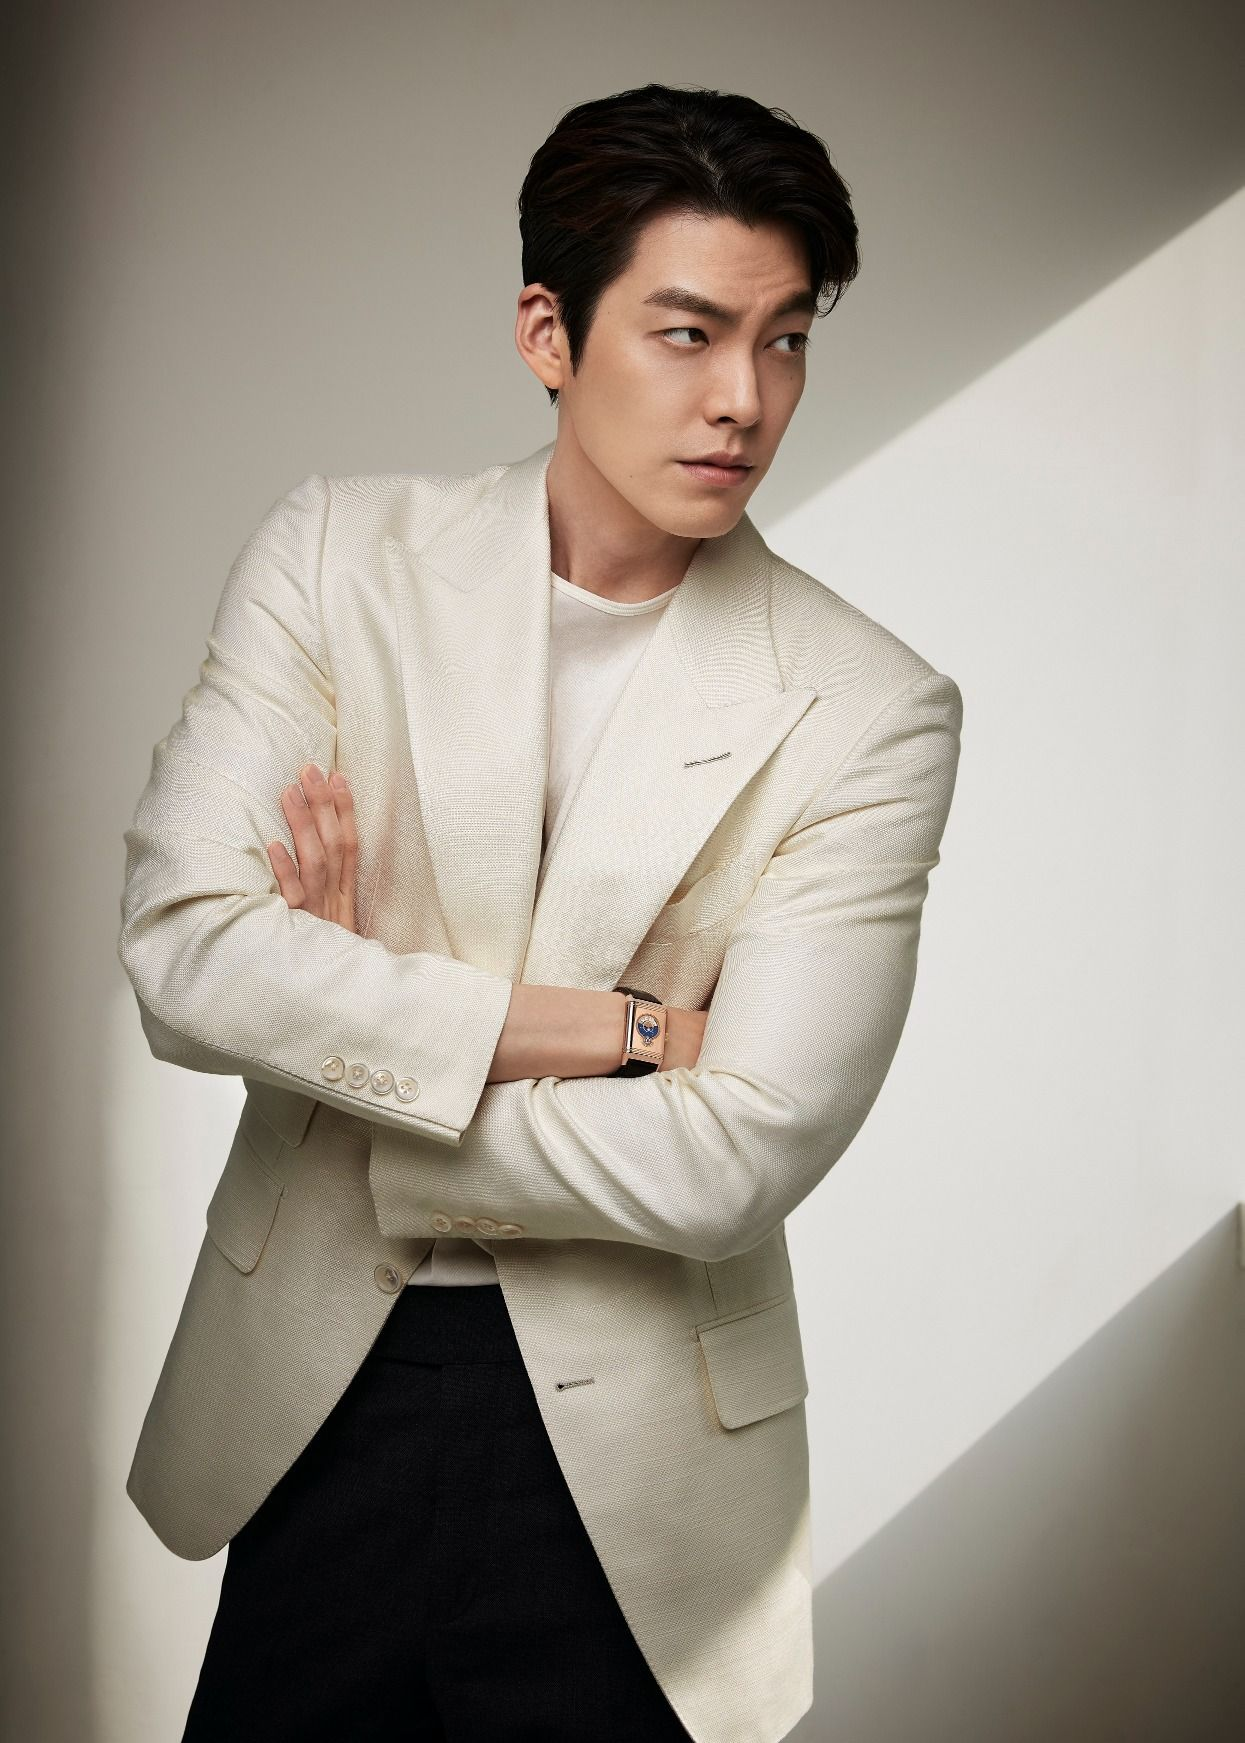 The Luxury Watch Kim Woo-Bin Is Wearing As Jaeger-LeCoultre's New Brand Ambassador